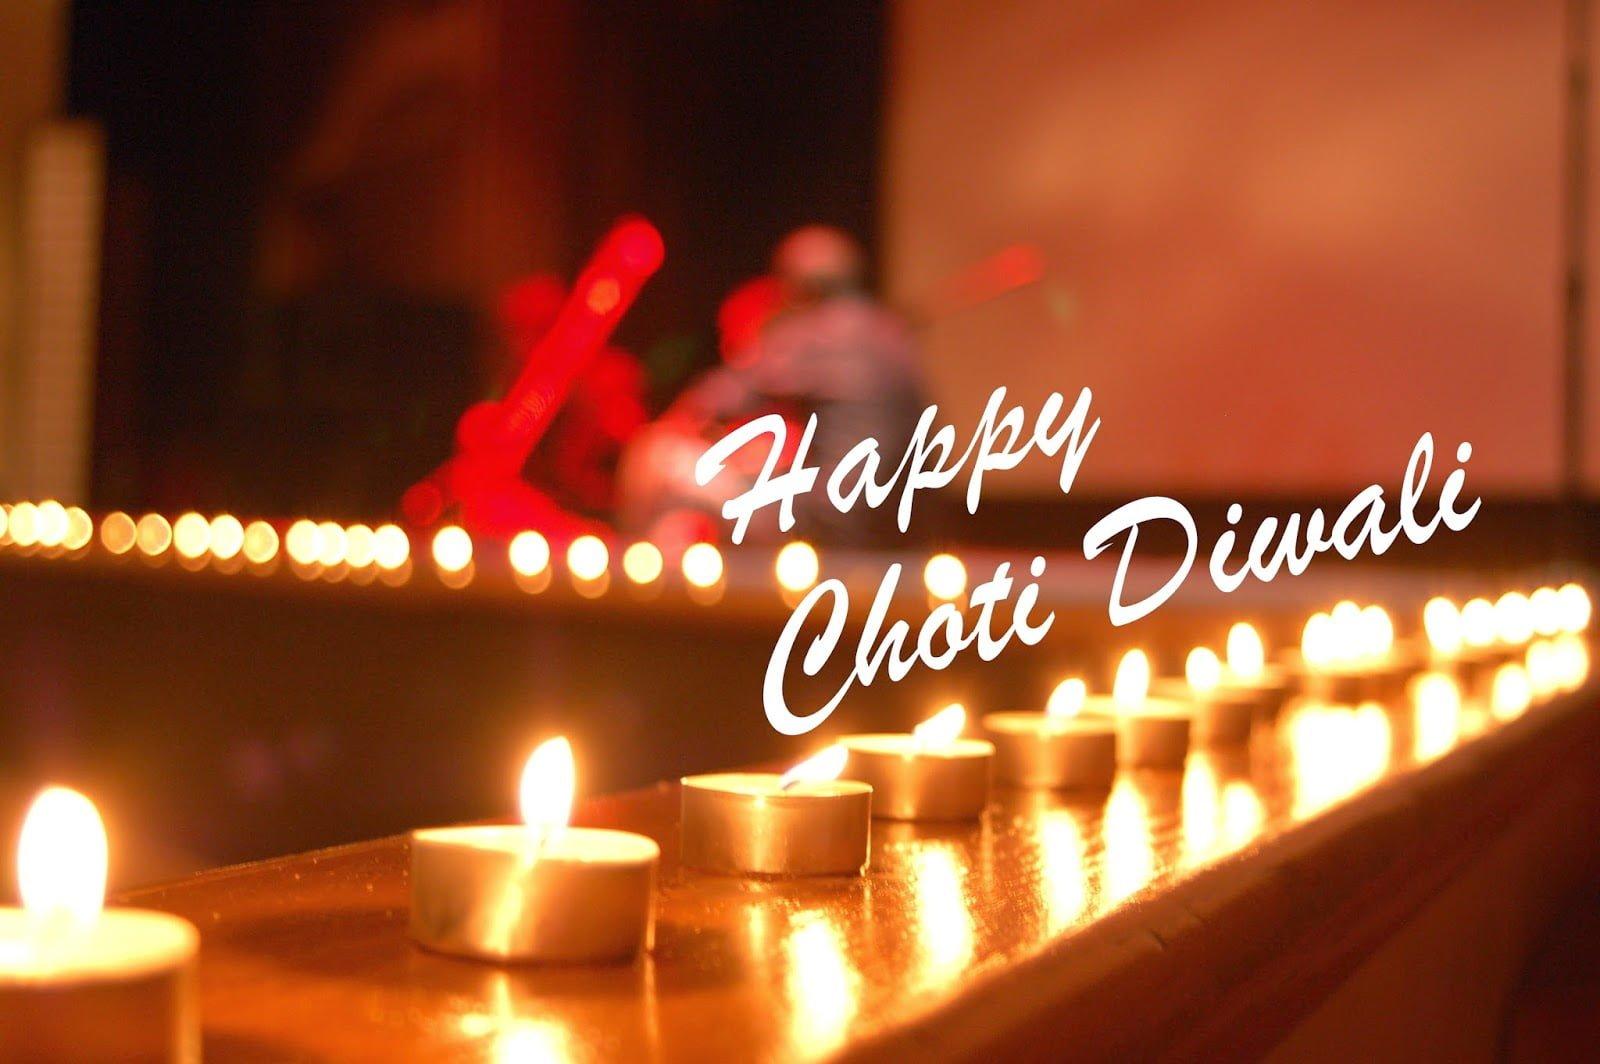 Happy Choti Diwali 2019 Hd Wallpaper For Desktop